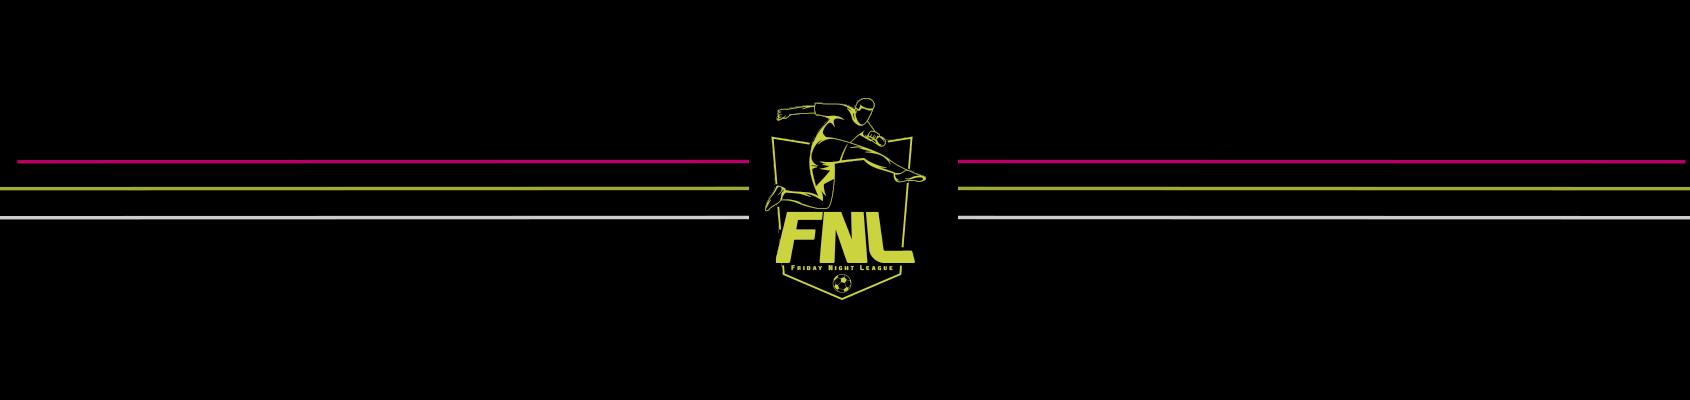 fnl website 2